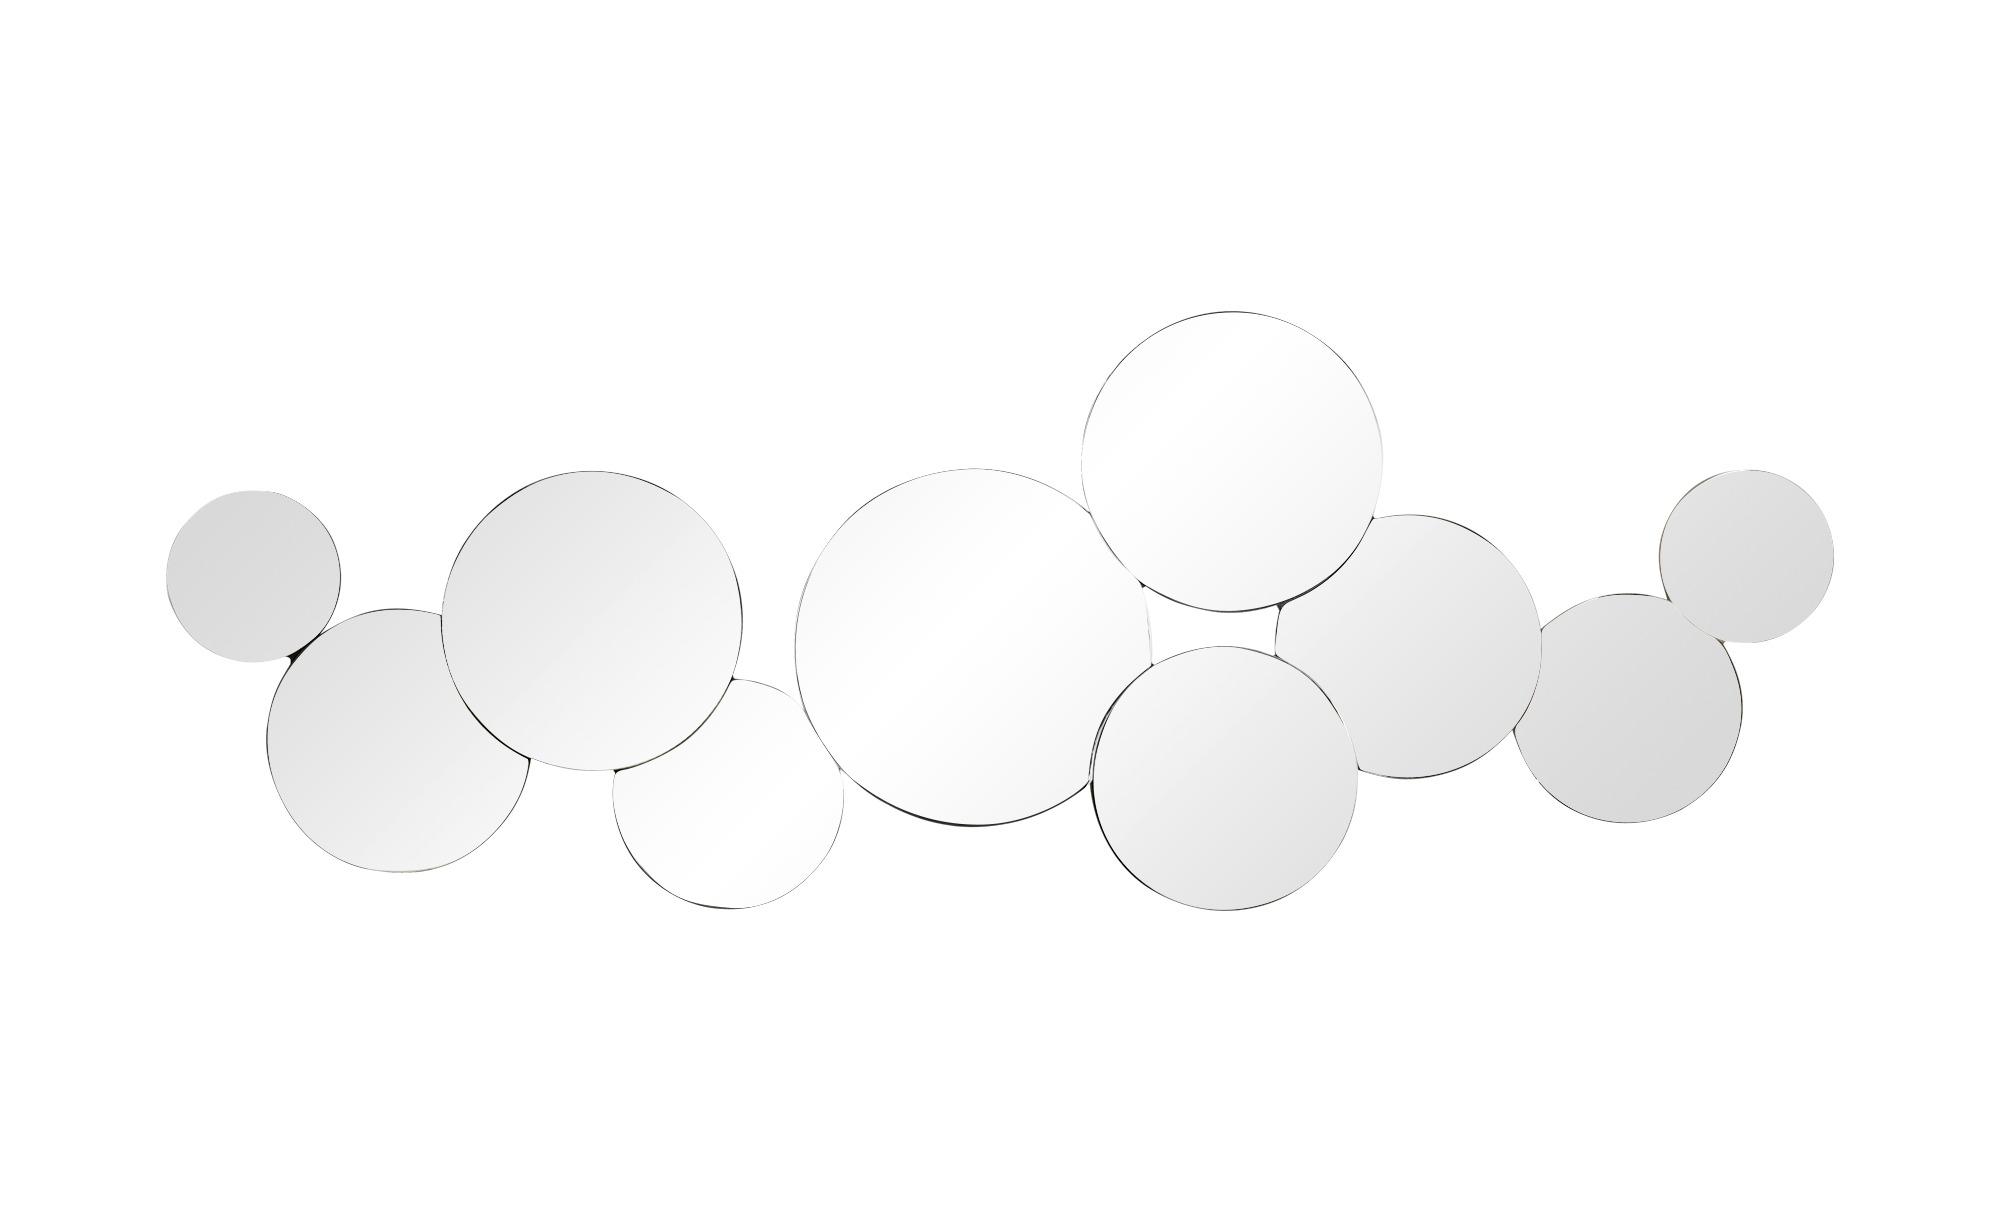 Wandspiegel capriolo breite 52 cm h he 144 cm silber for Spiegel 52 2017